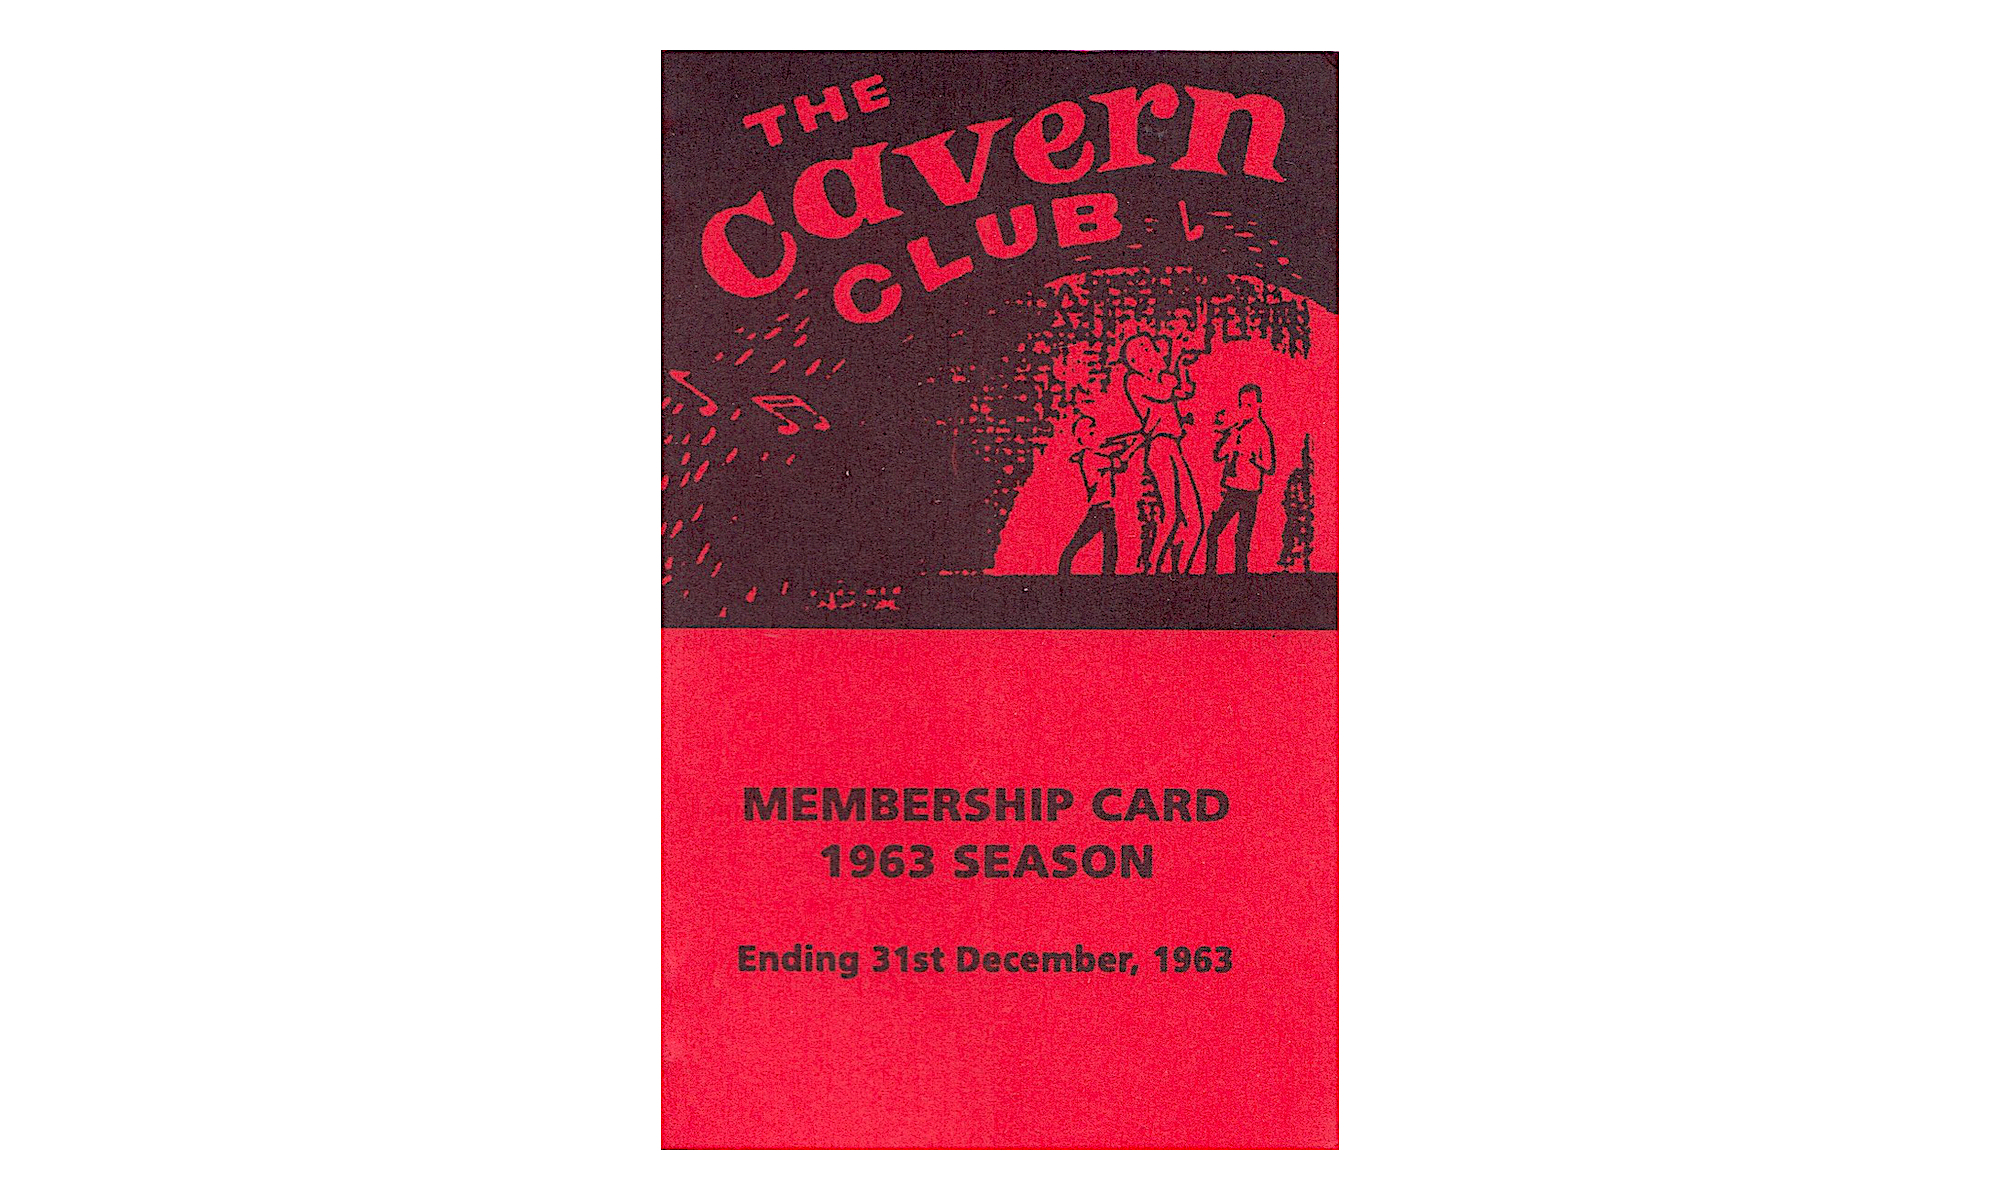 beatles cavern club card